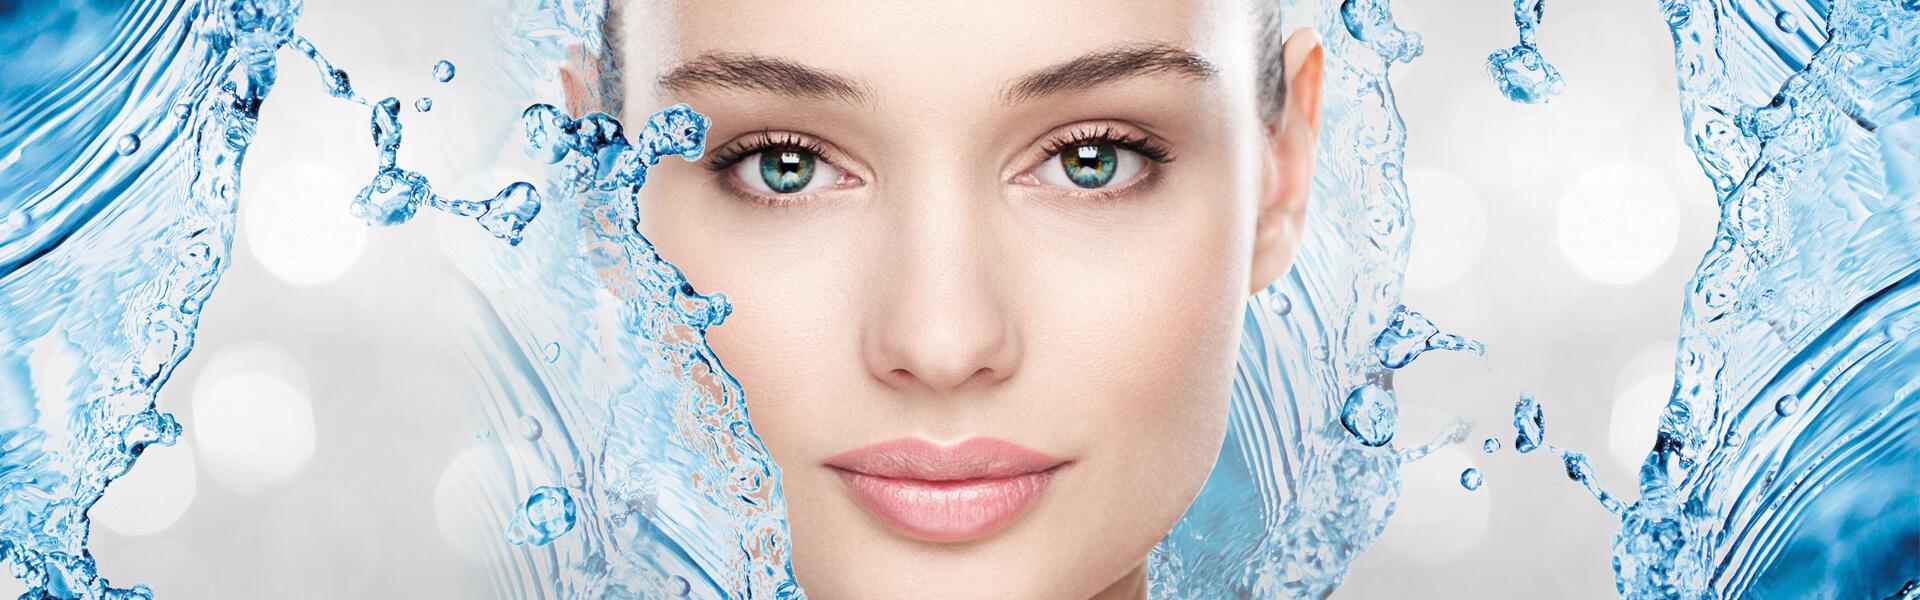 Aqua-Facial-Behandlung-Kosmetikstudio-HofBeauty